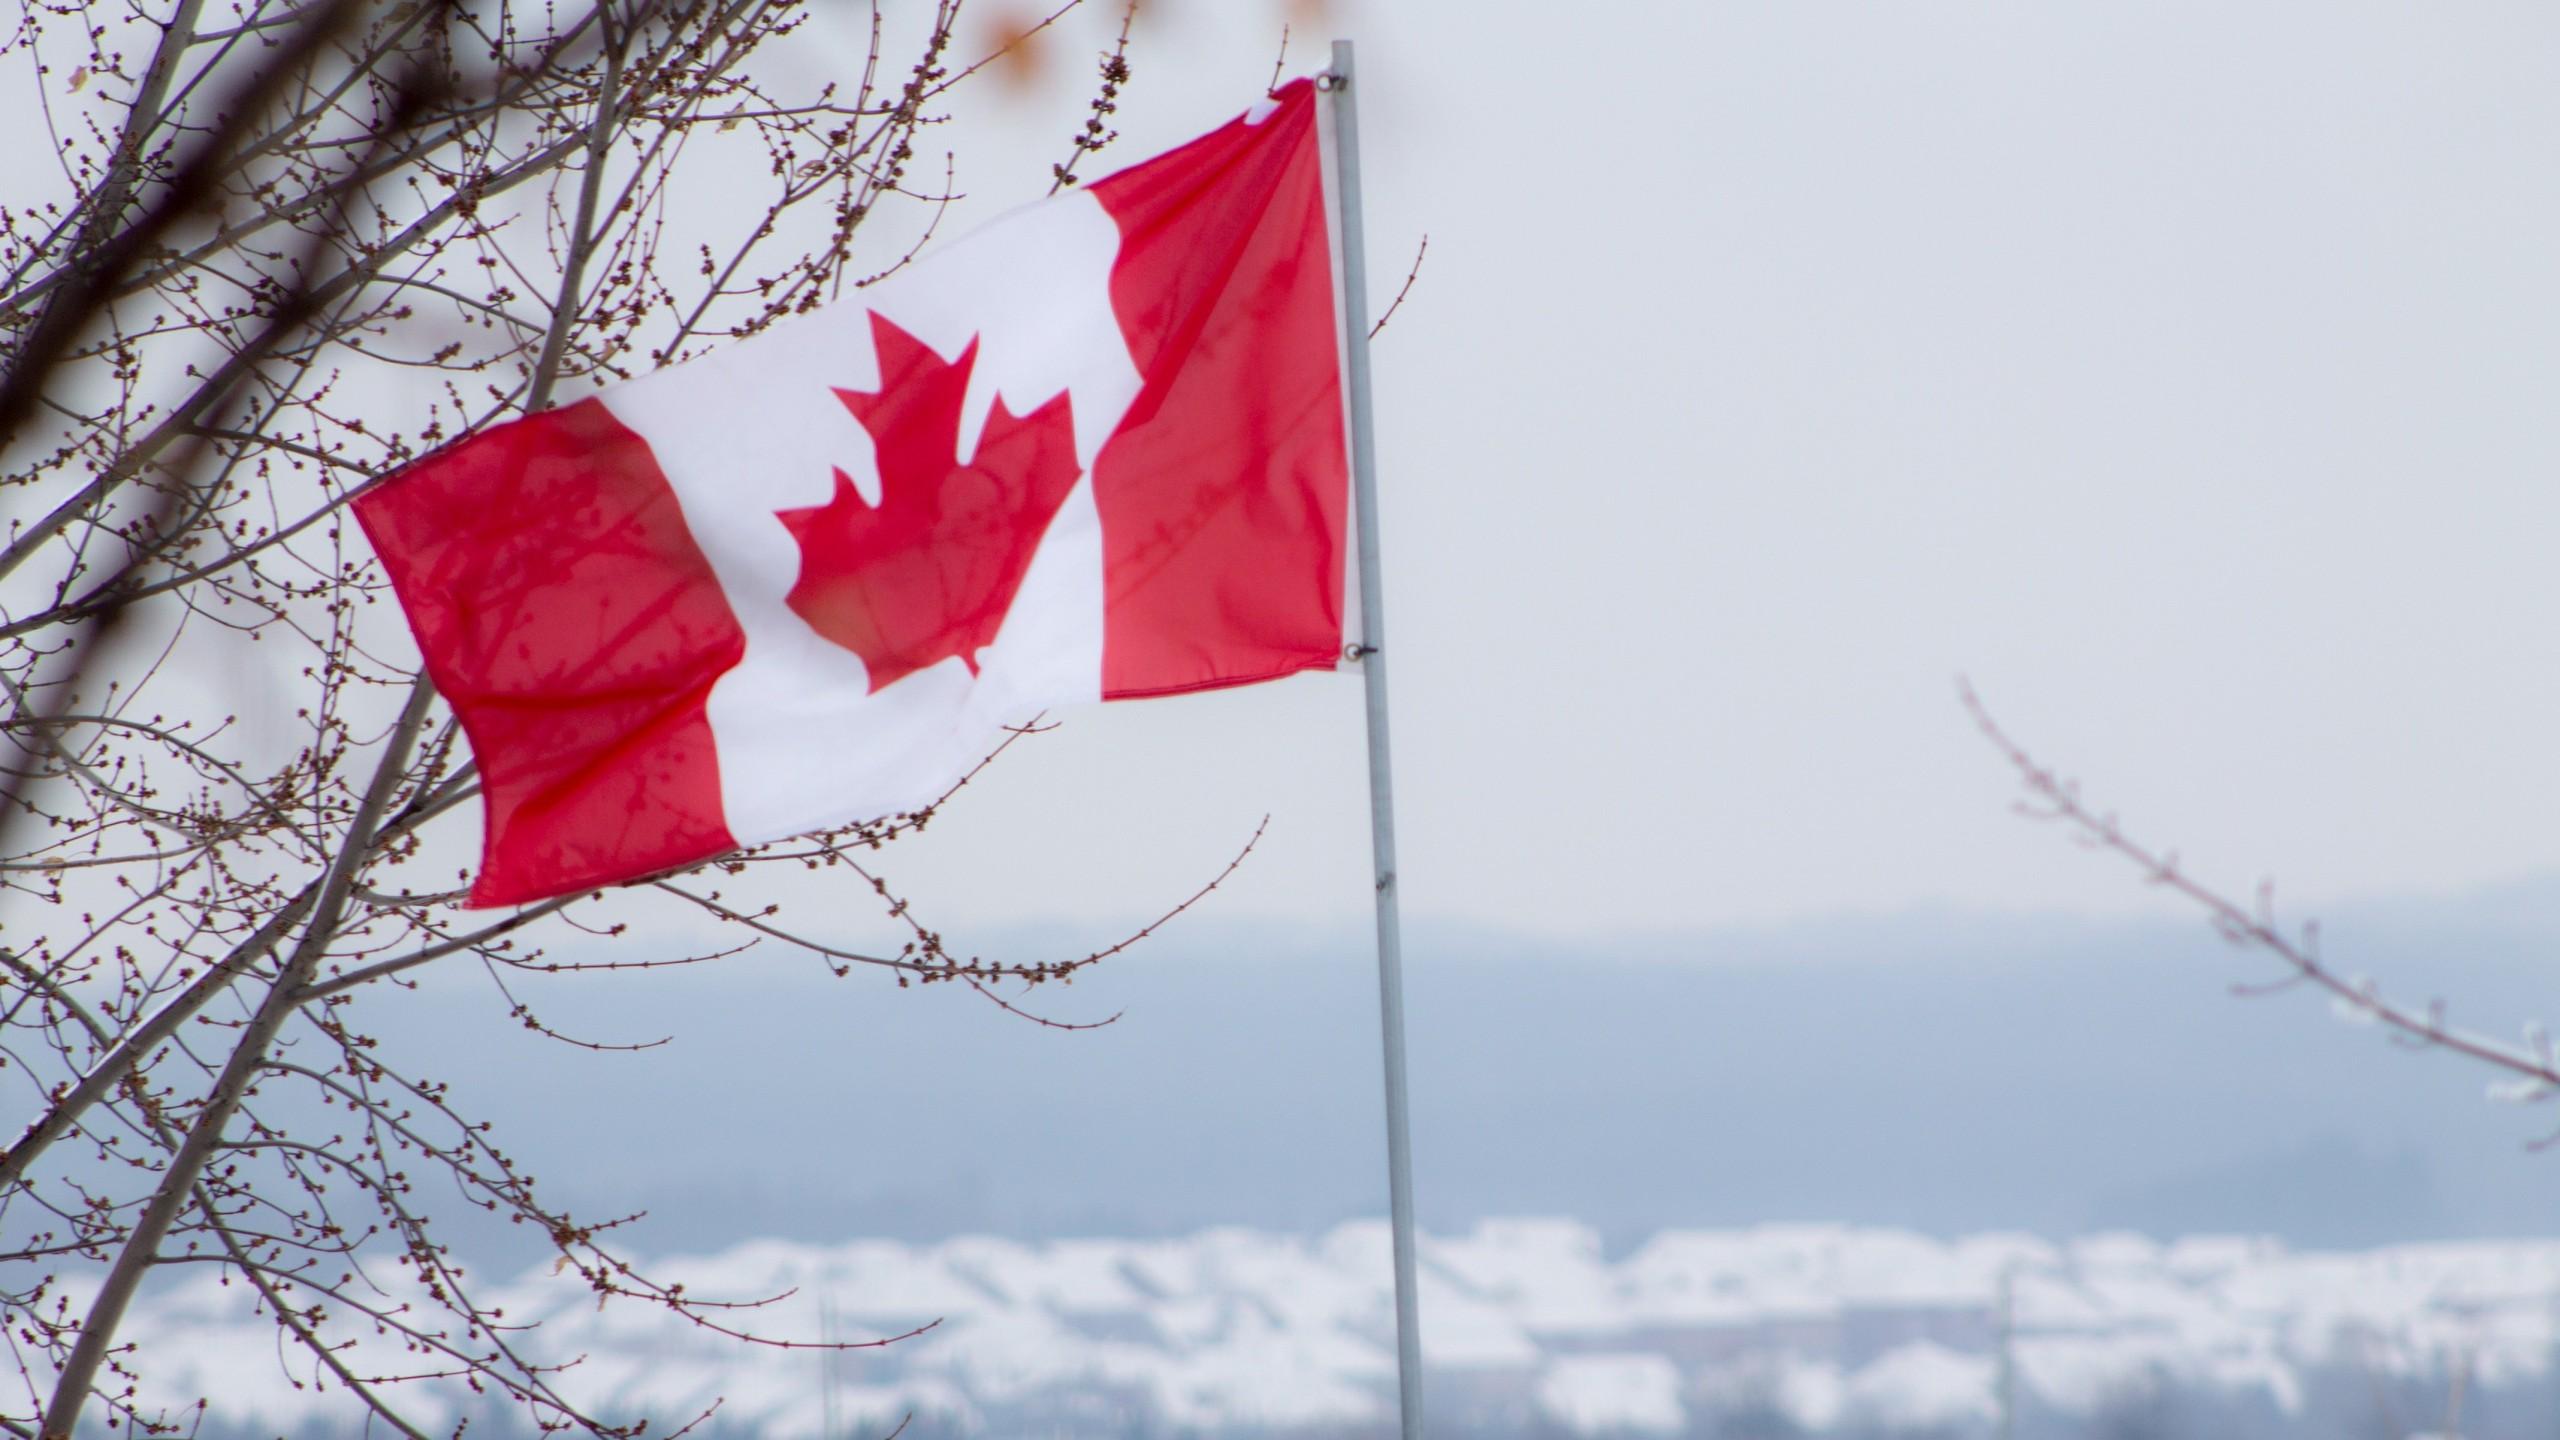 Inspriational Quotes Wallpaper For Mac Canada Flag Wallpapers Hd Pixelstalk Net